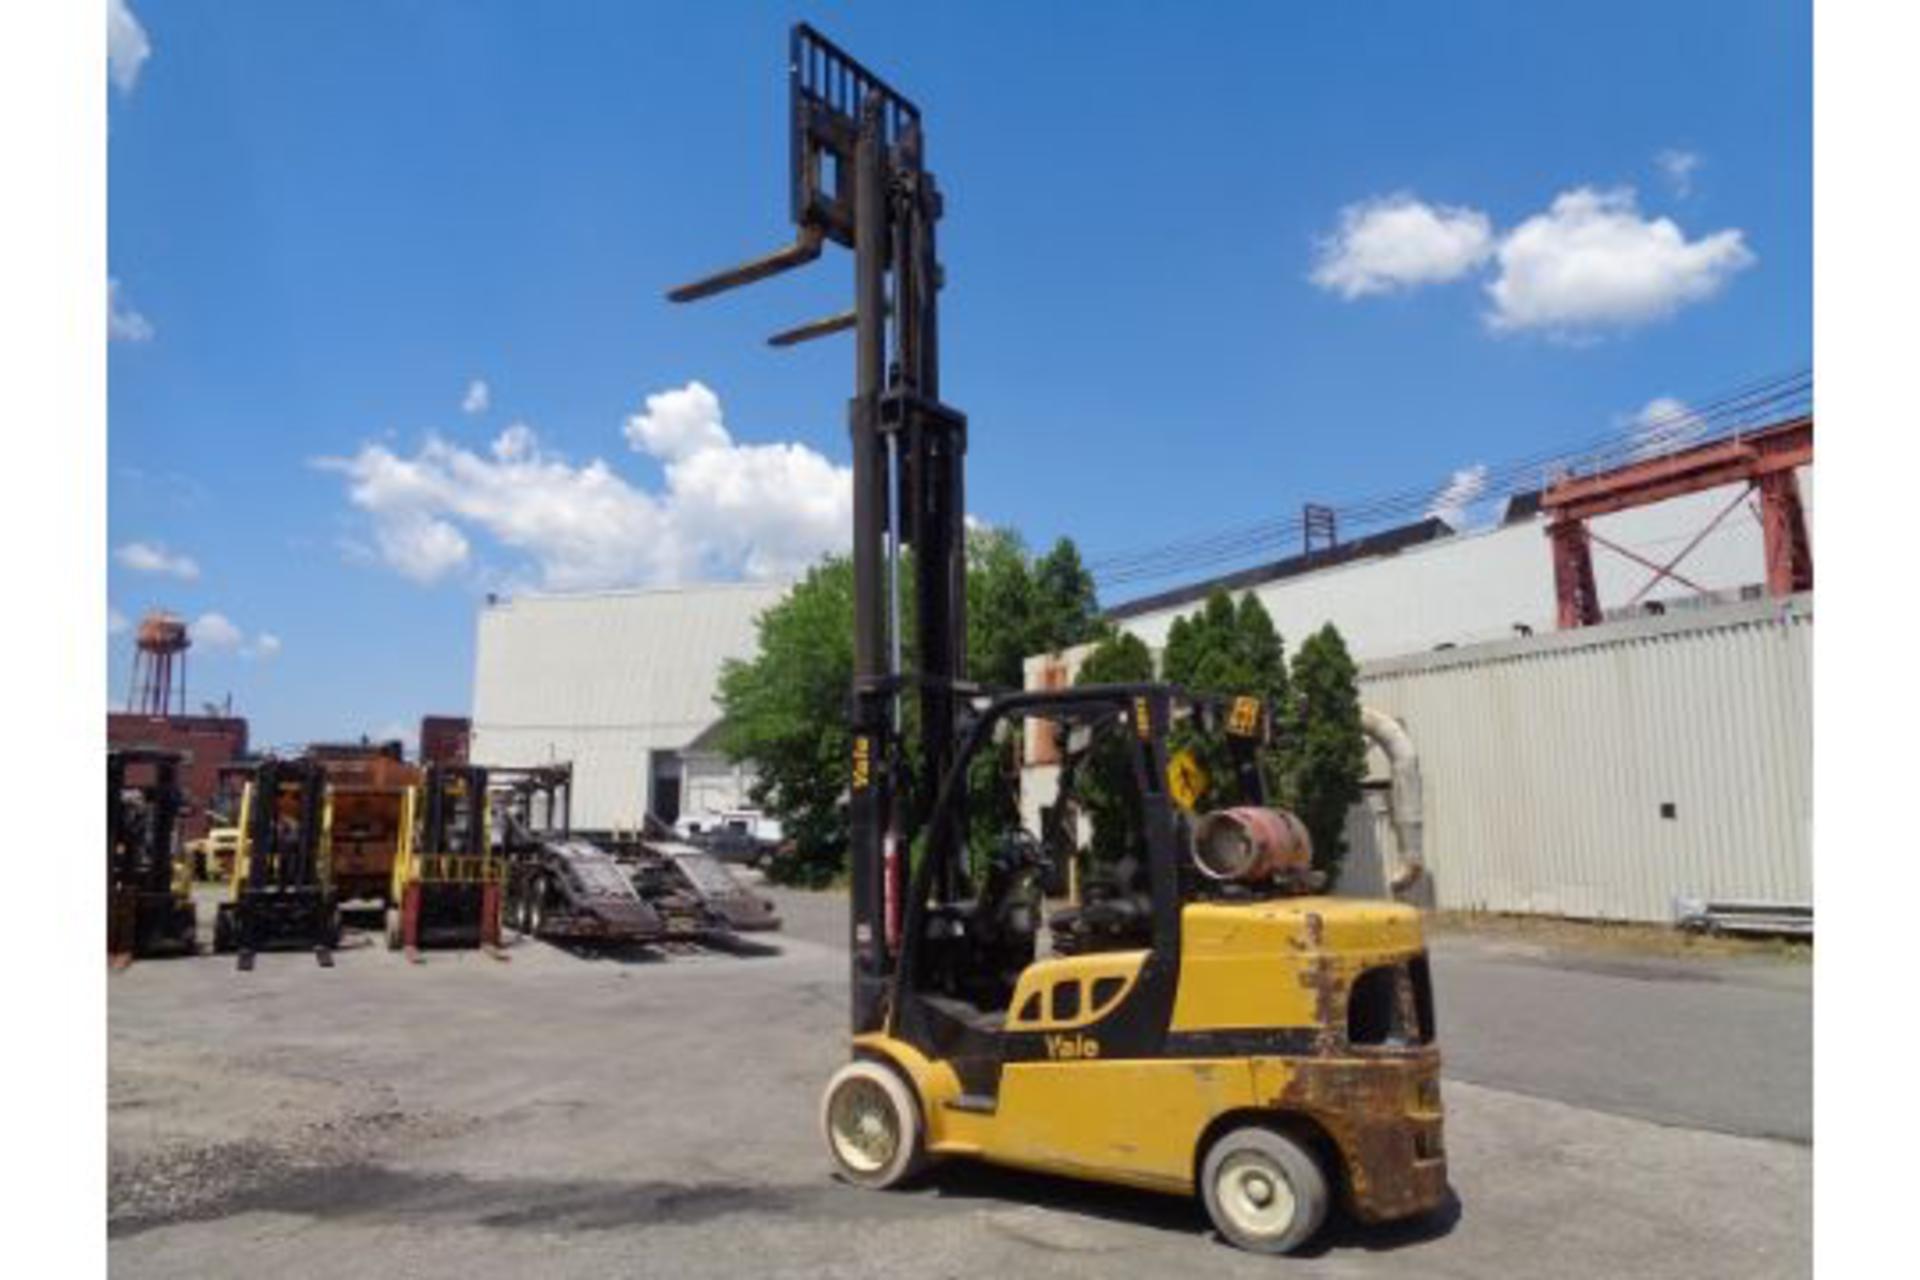 Lot 53 - 2012 Yale GLC100VXNGSE092 10,000lb Forklift